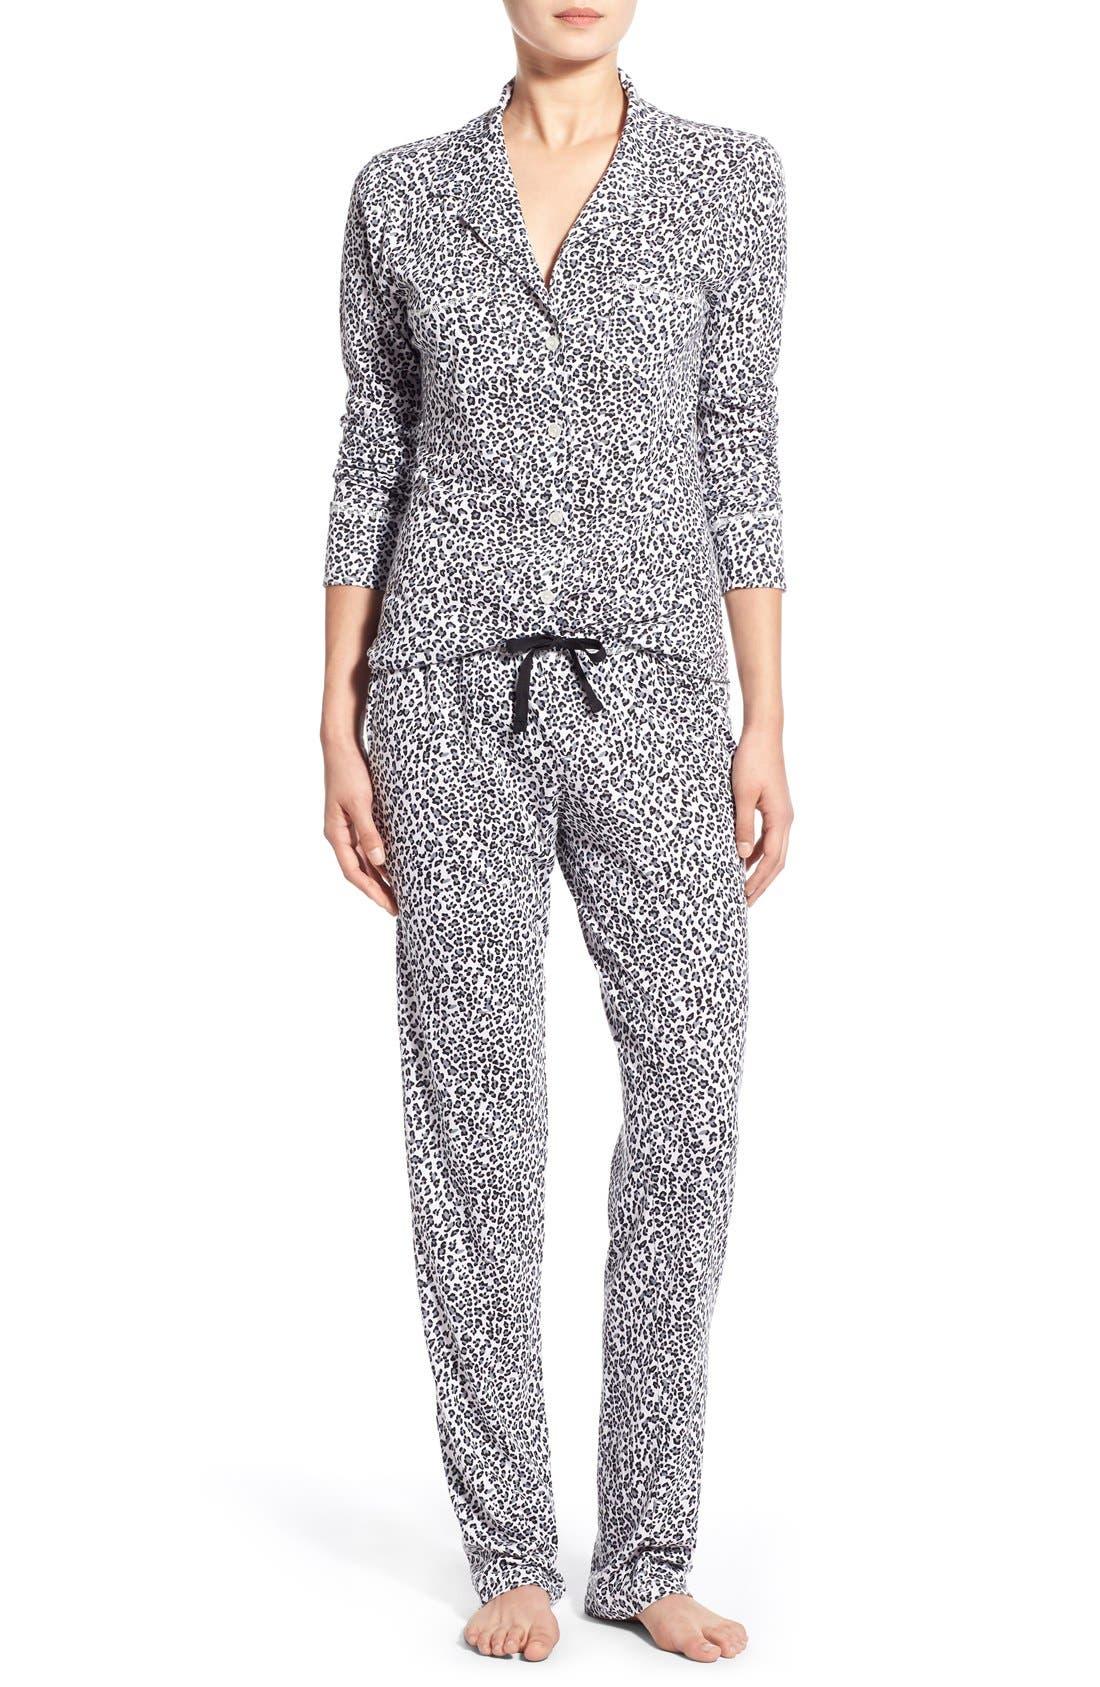 Alternate Image 1 Selected - Love+Grace 'Cassie' Print Pajamas